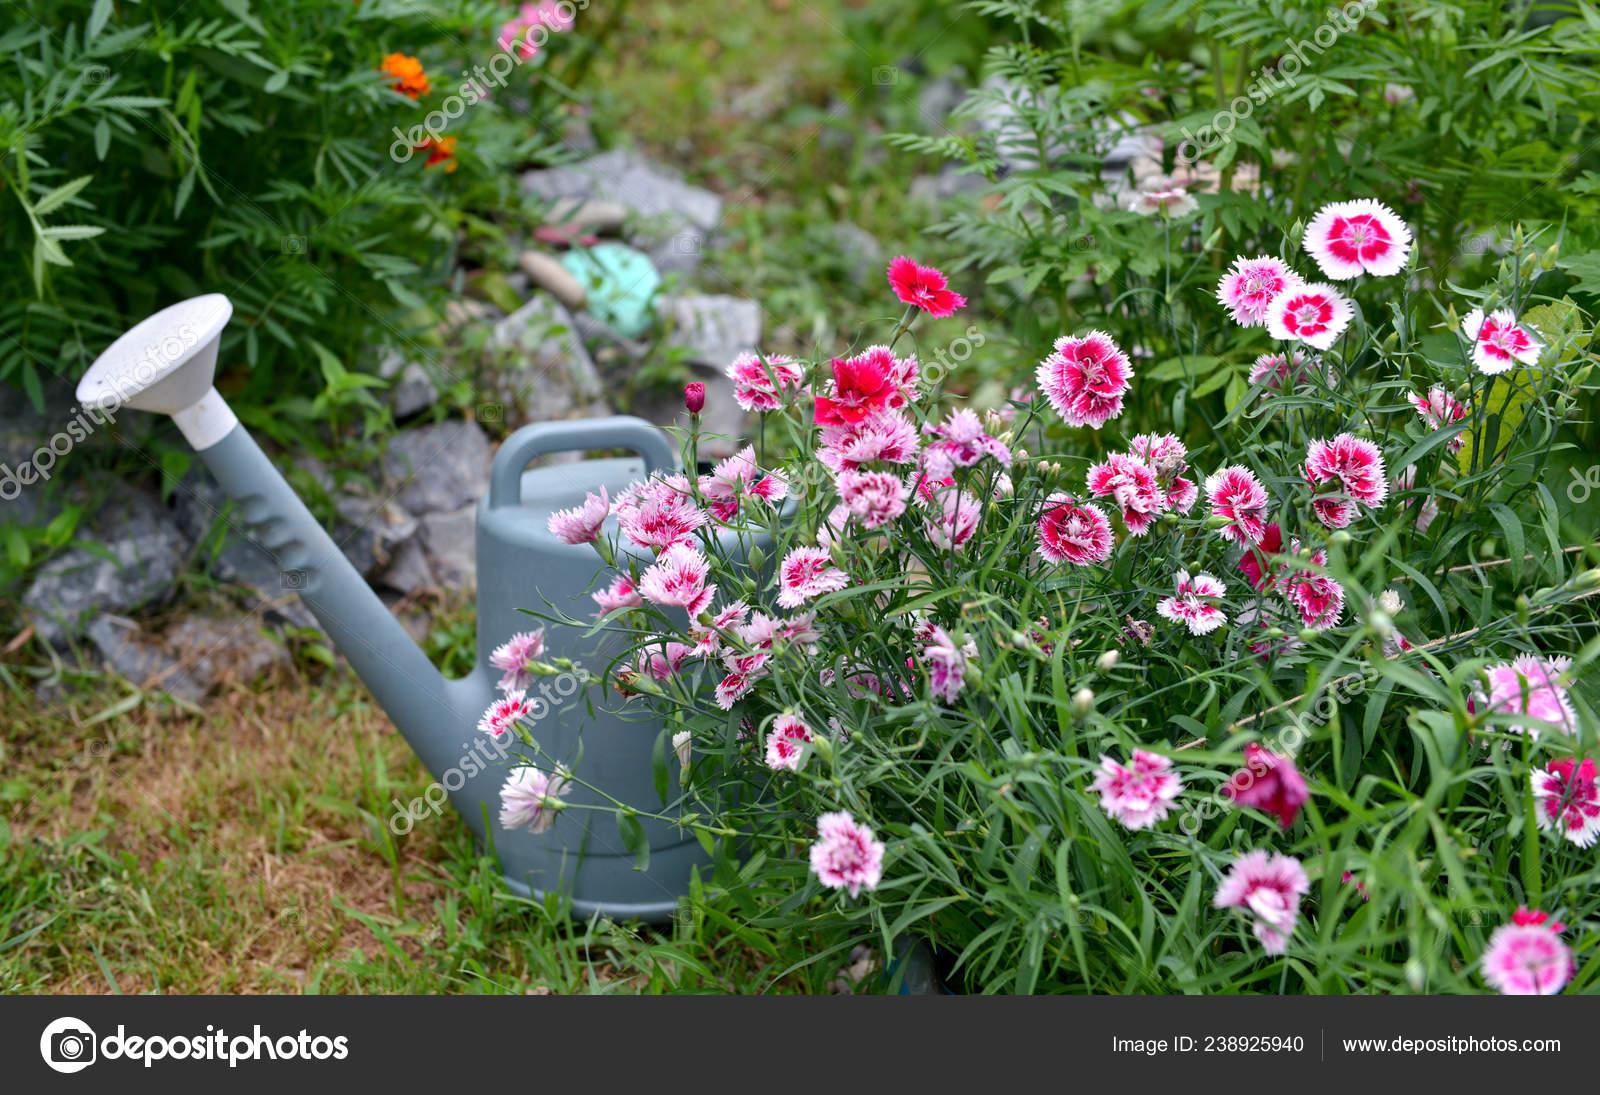 Beautiful Flowerbed Carnation Flowers Watering Can Garden Summer